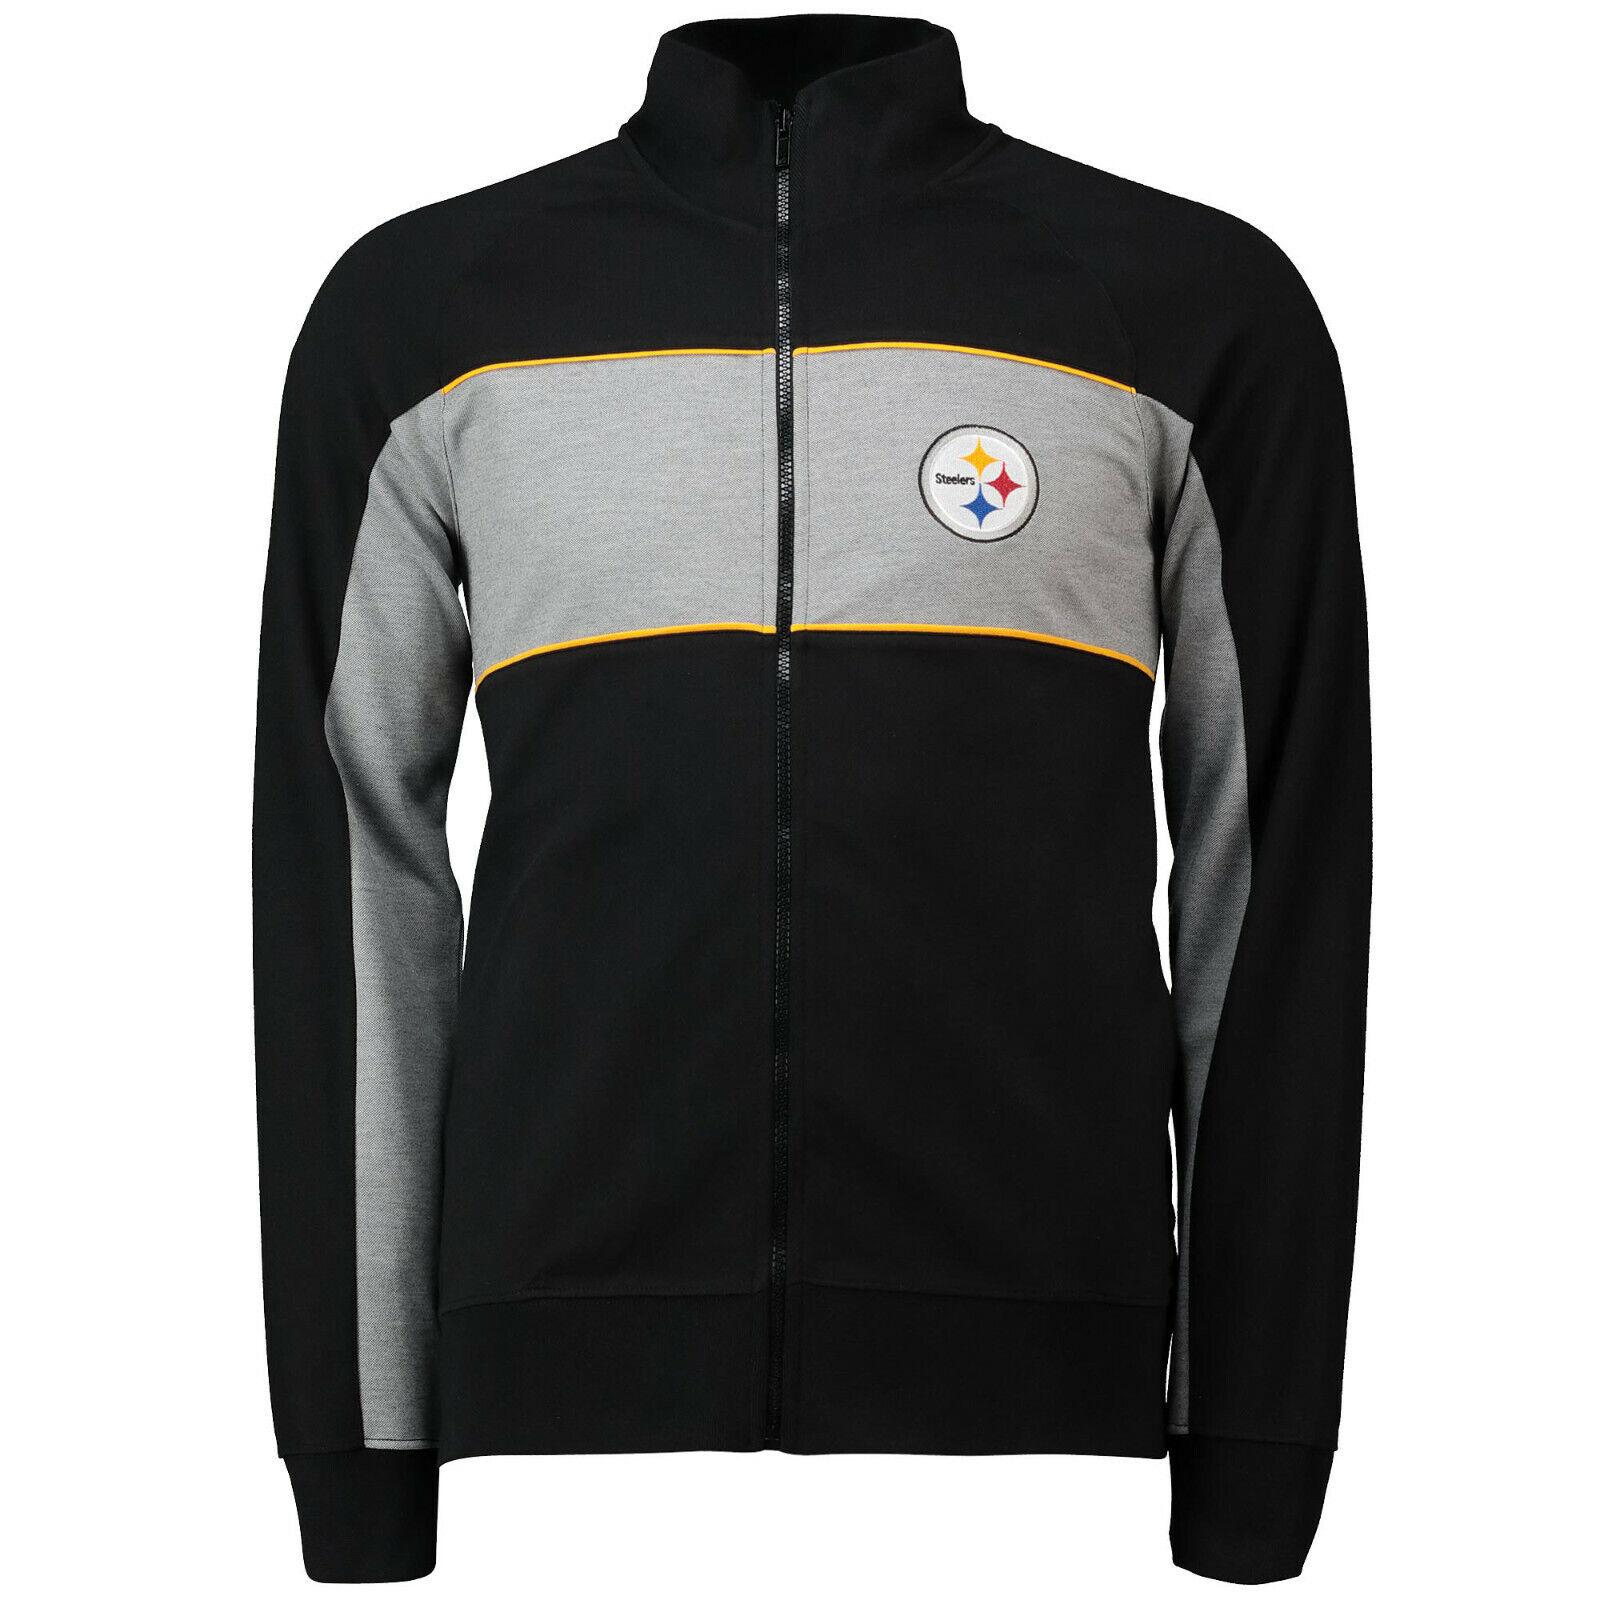 NFL Jacke Pittsburgh Steelers Cut and Sew Track Jacket Trainingsjacke Football